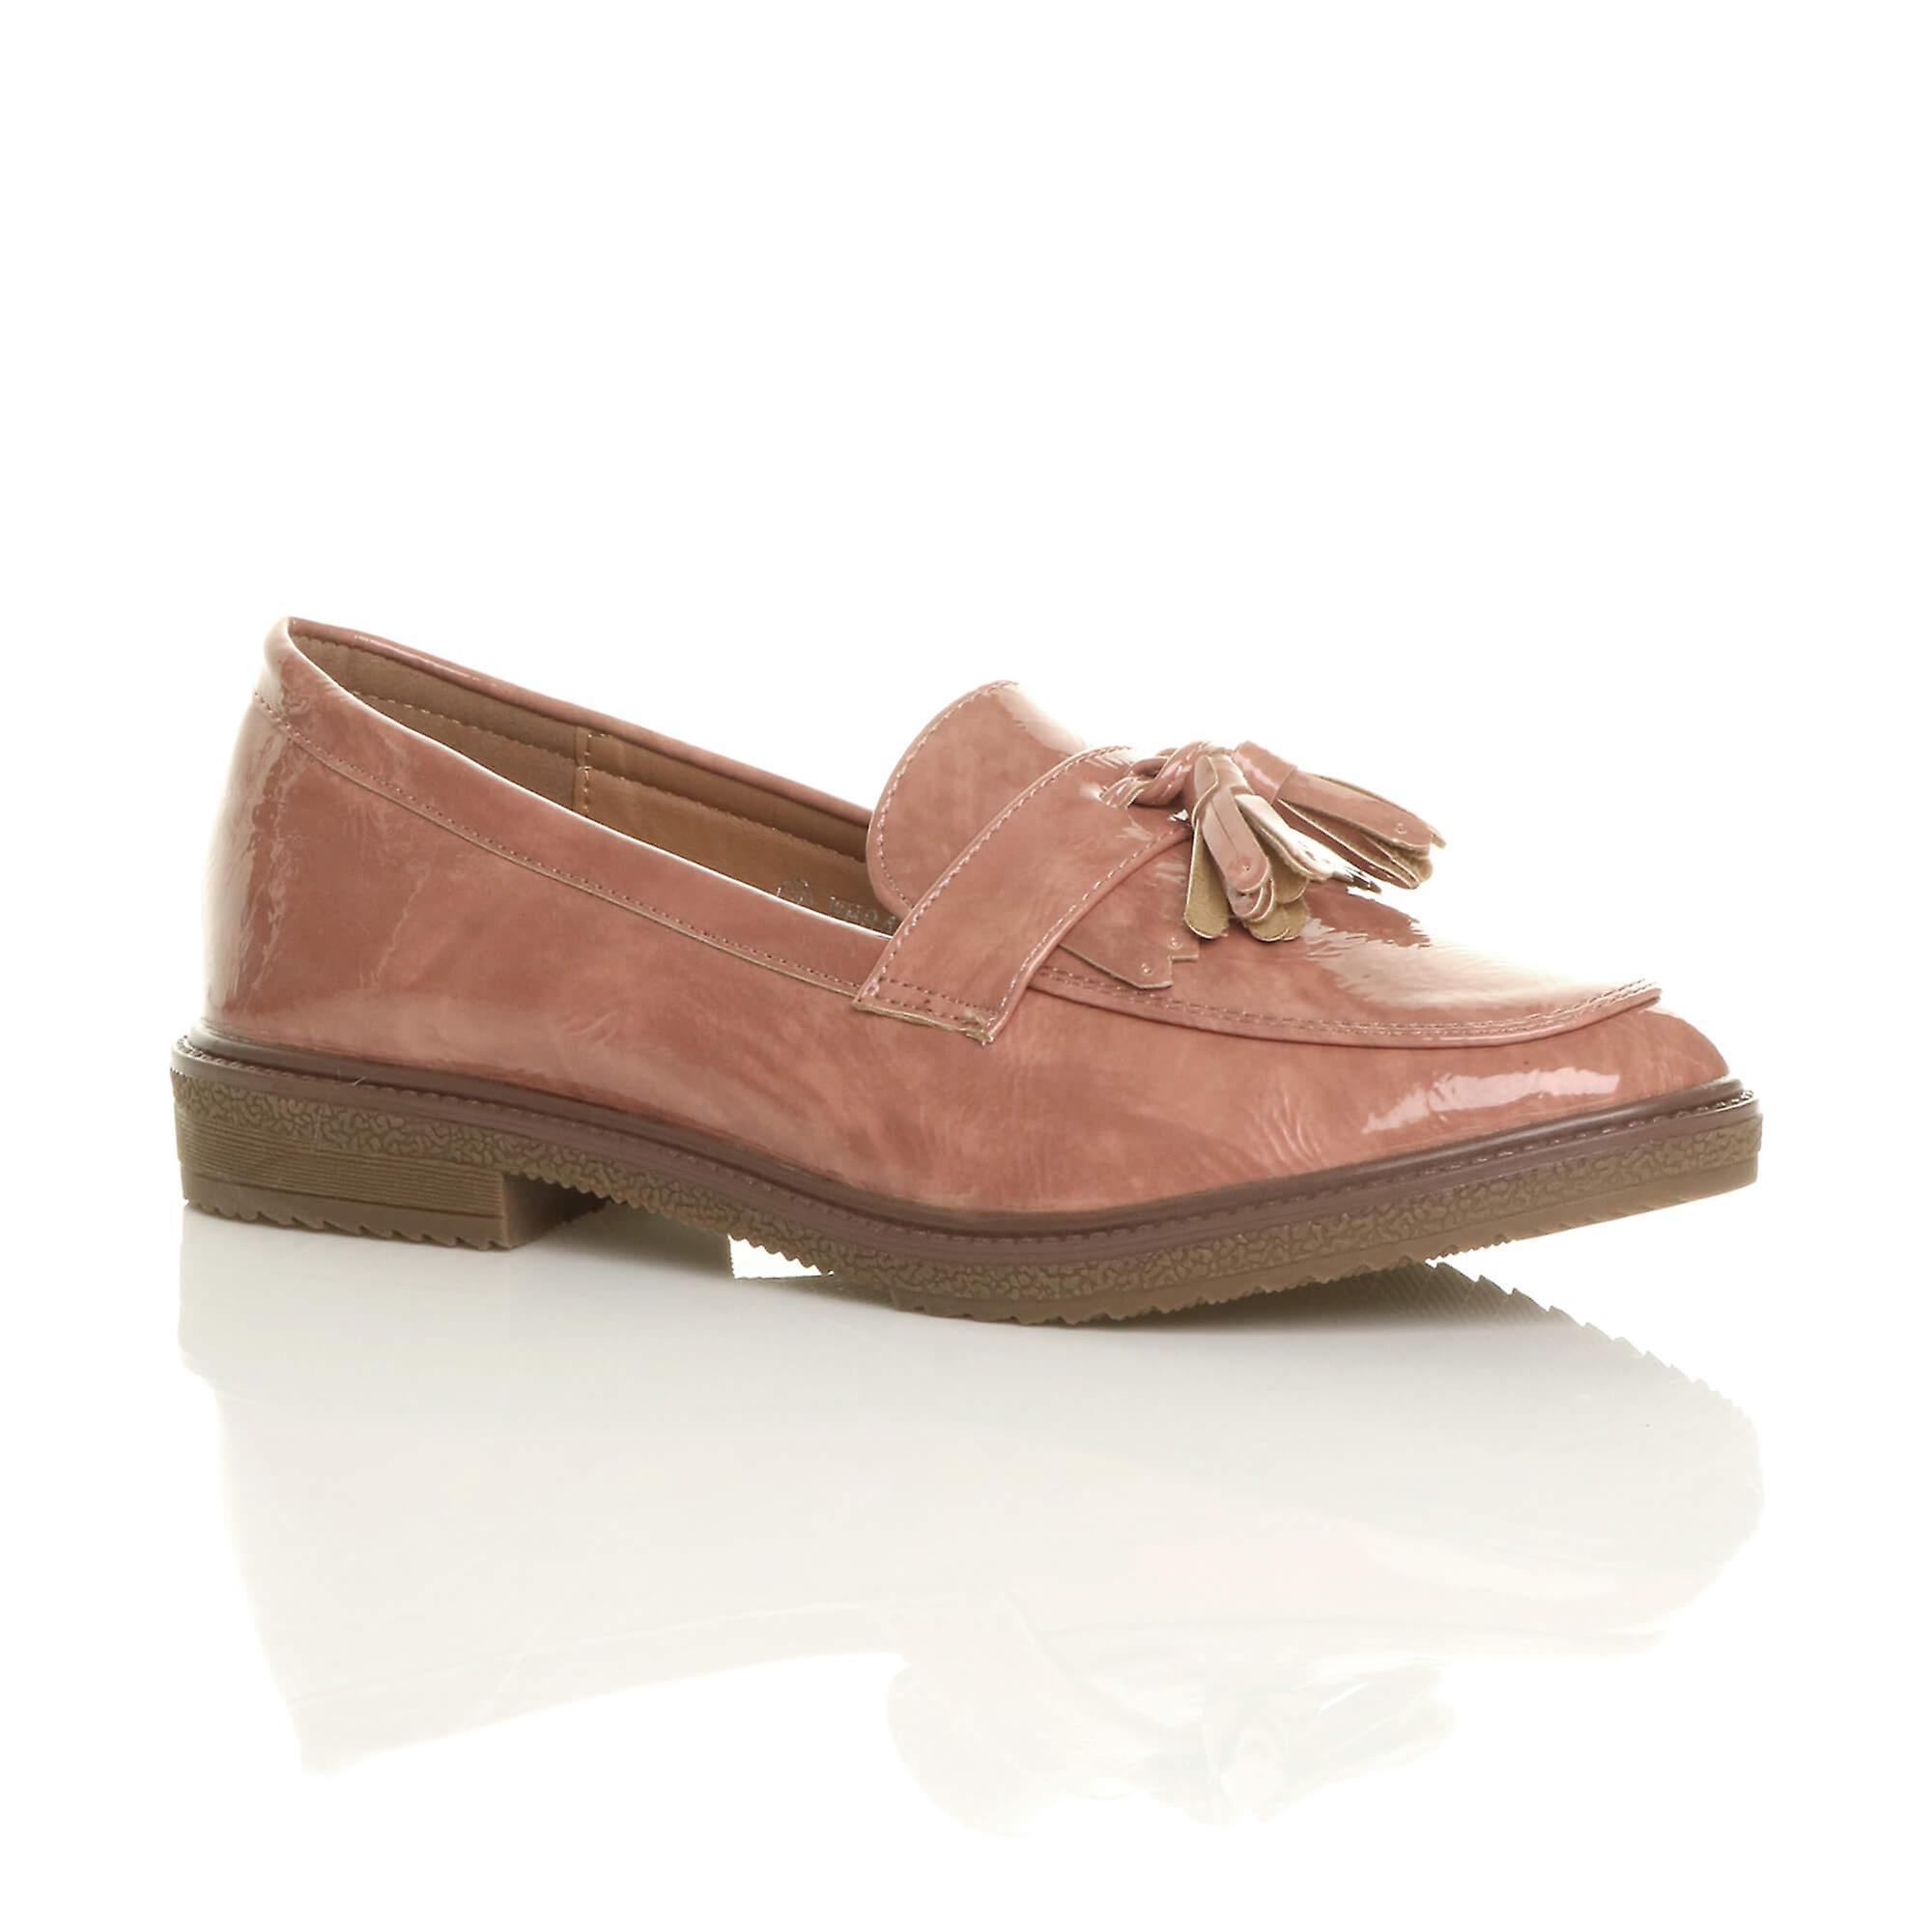 Ajvani womens flat low heel fringe tassel moccasins loafers smart shoes dEHuD